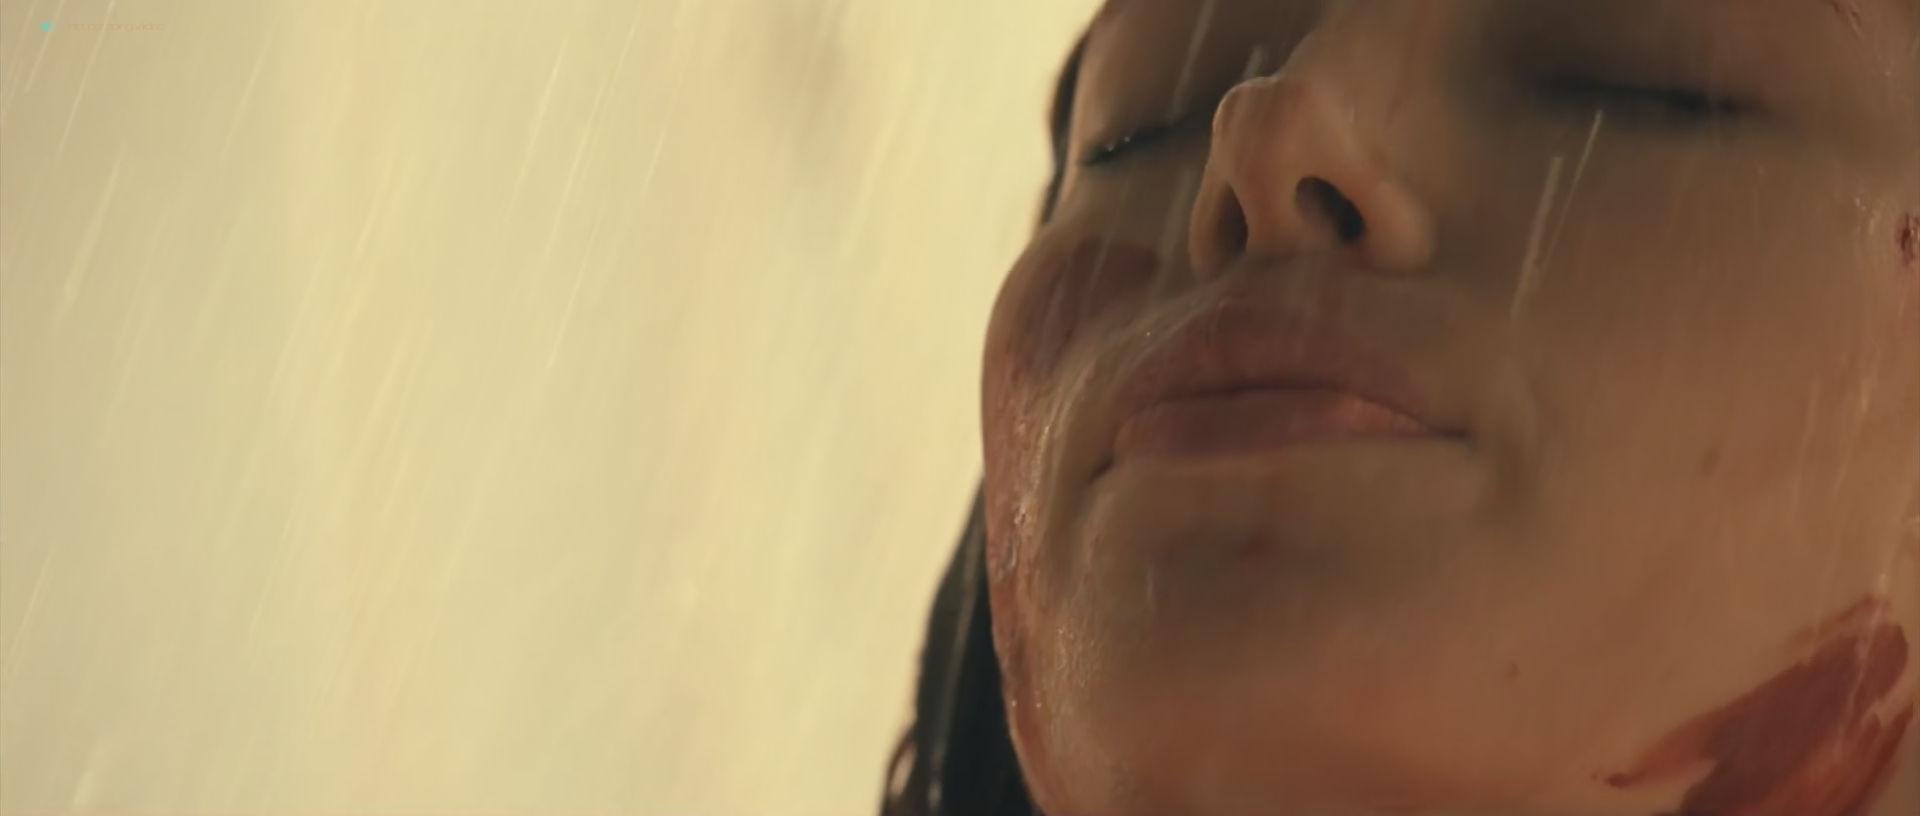 Jessica Biel hot and sexy - Blade Trinity (2004) HD 1080p BluRay (15)